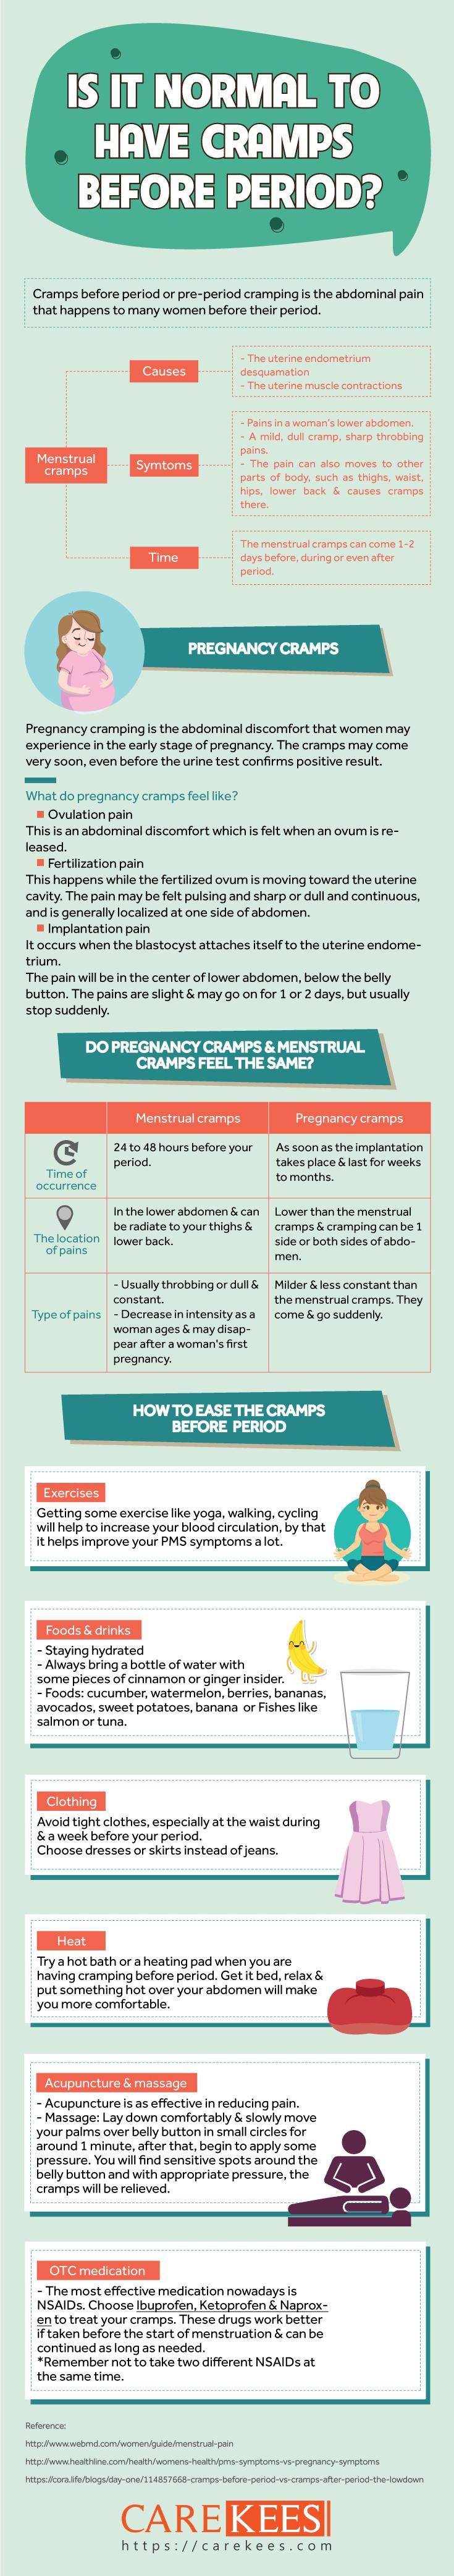 cramps-before-period